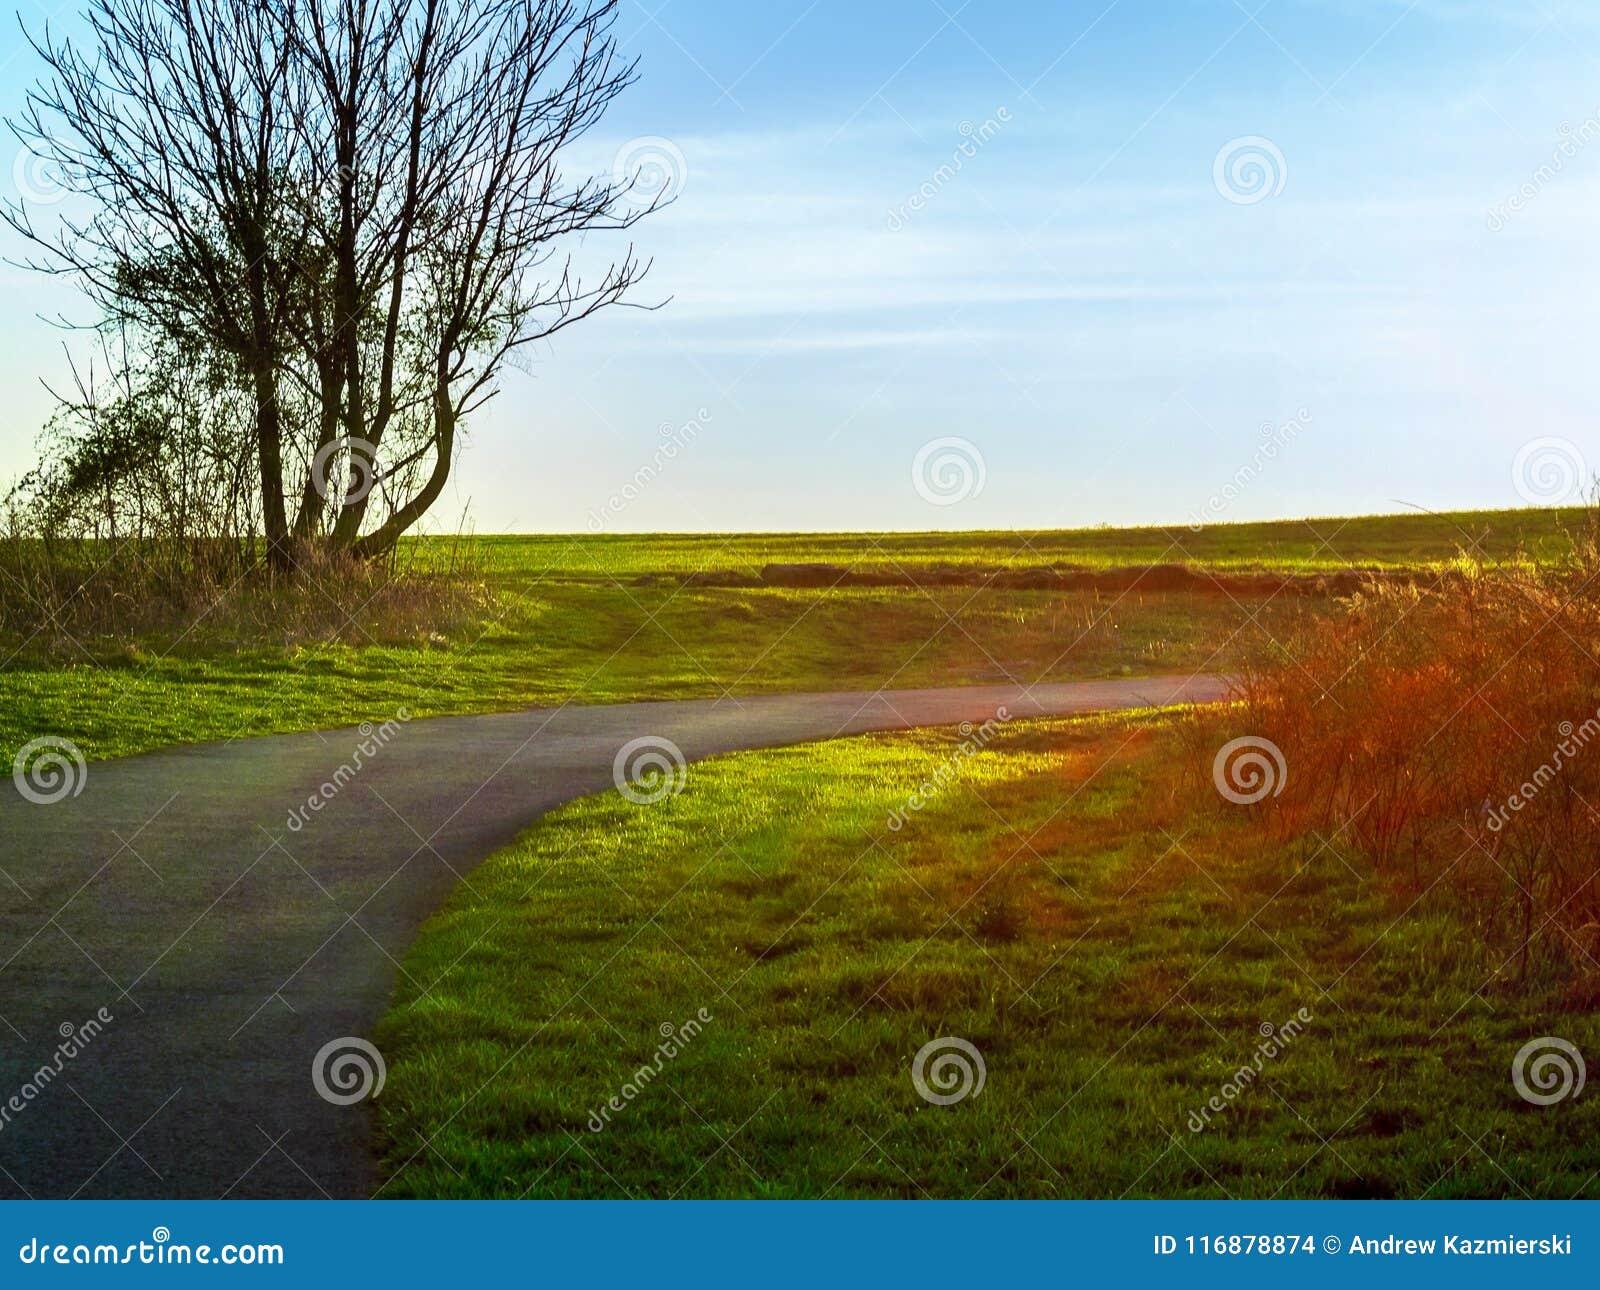 Around the Bend stock photo. Image of hillside, bike - 116878874 3db98c2be8